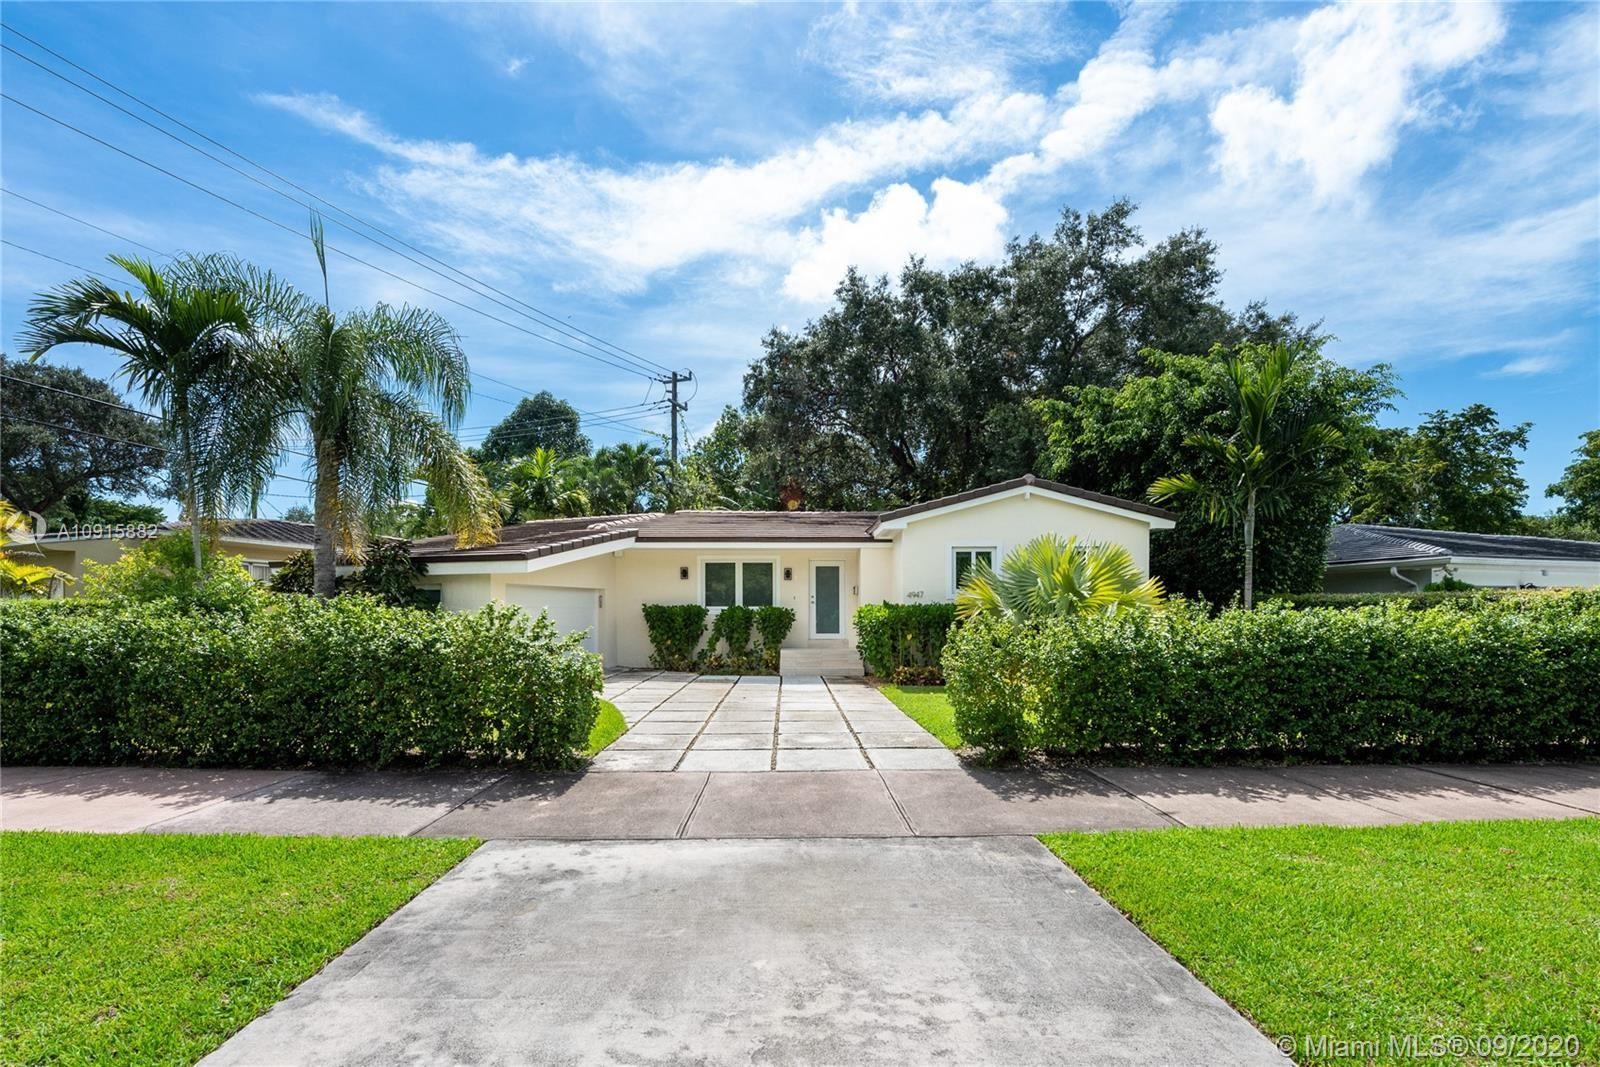 4947 Riviera Dr, Coral Gables, FL 33146 - #: A10915882